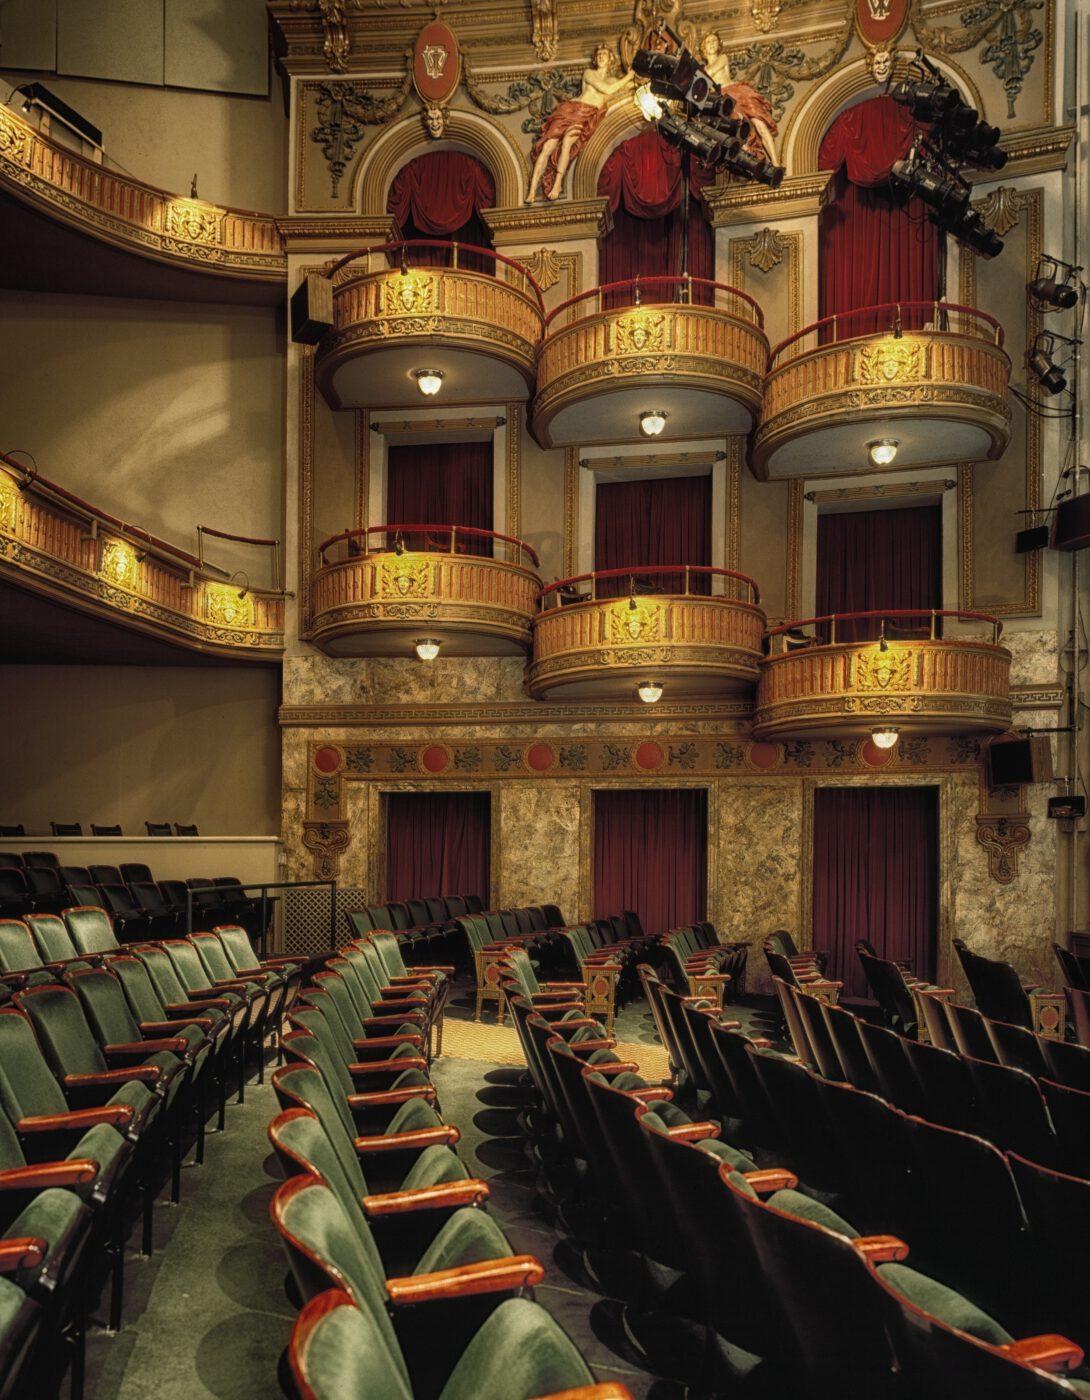 Aberglaube im Theater (BACKDROP.de)